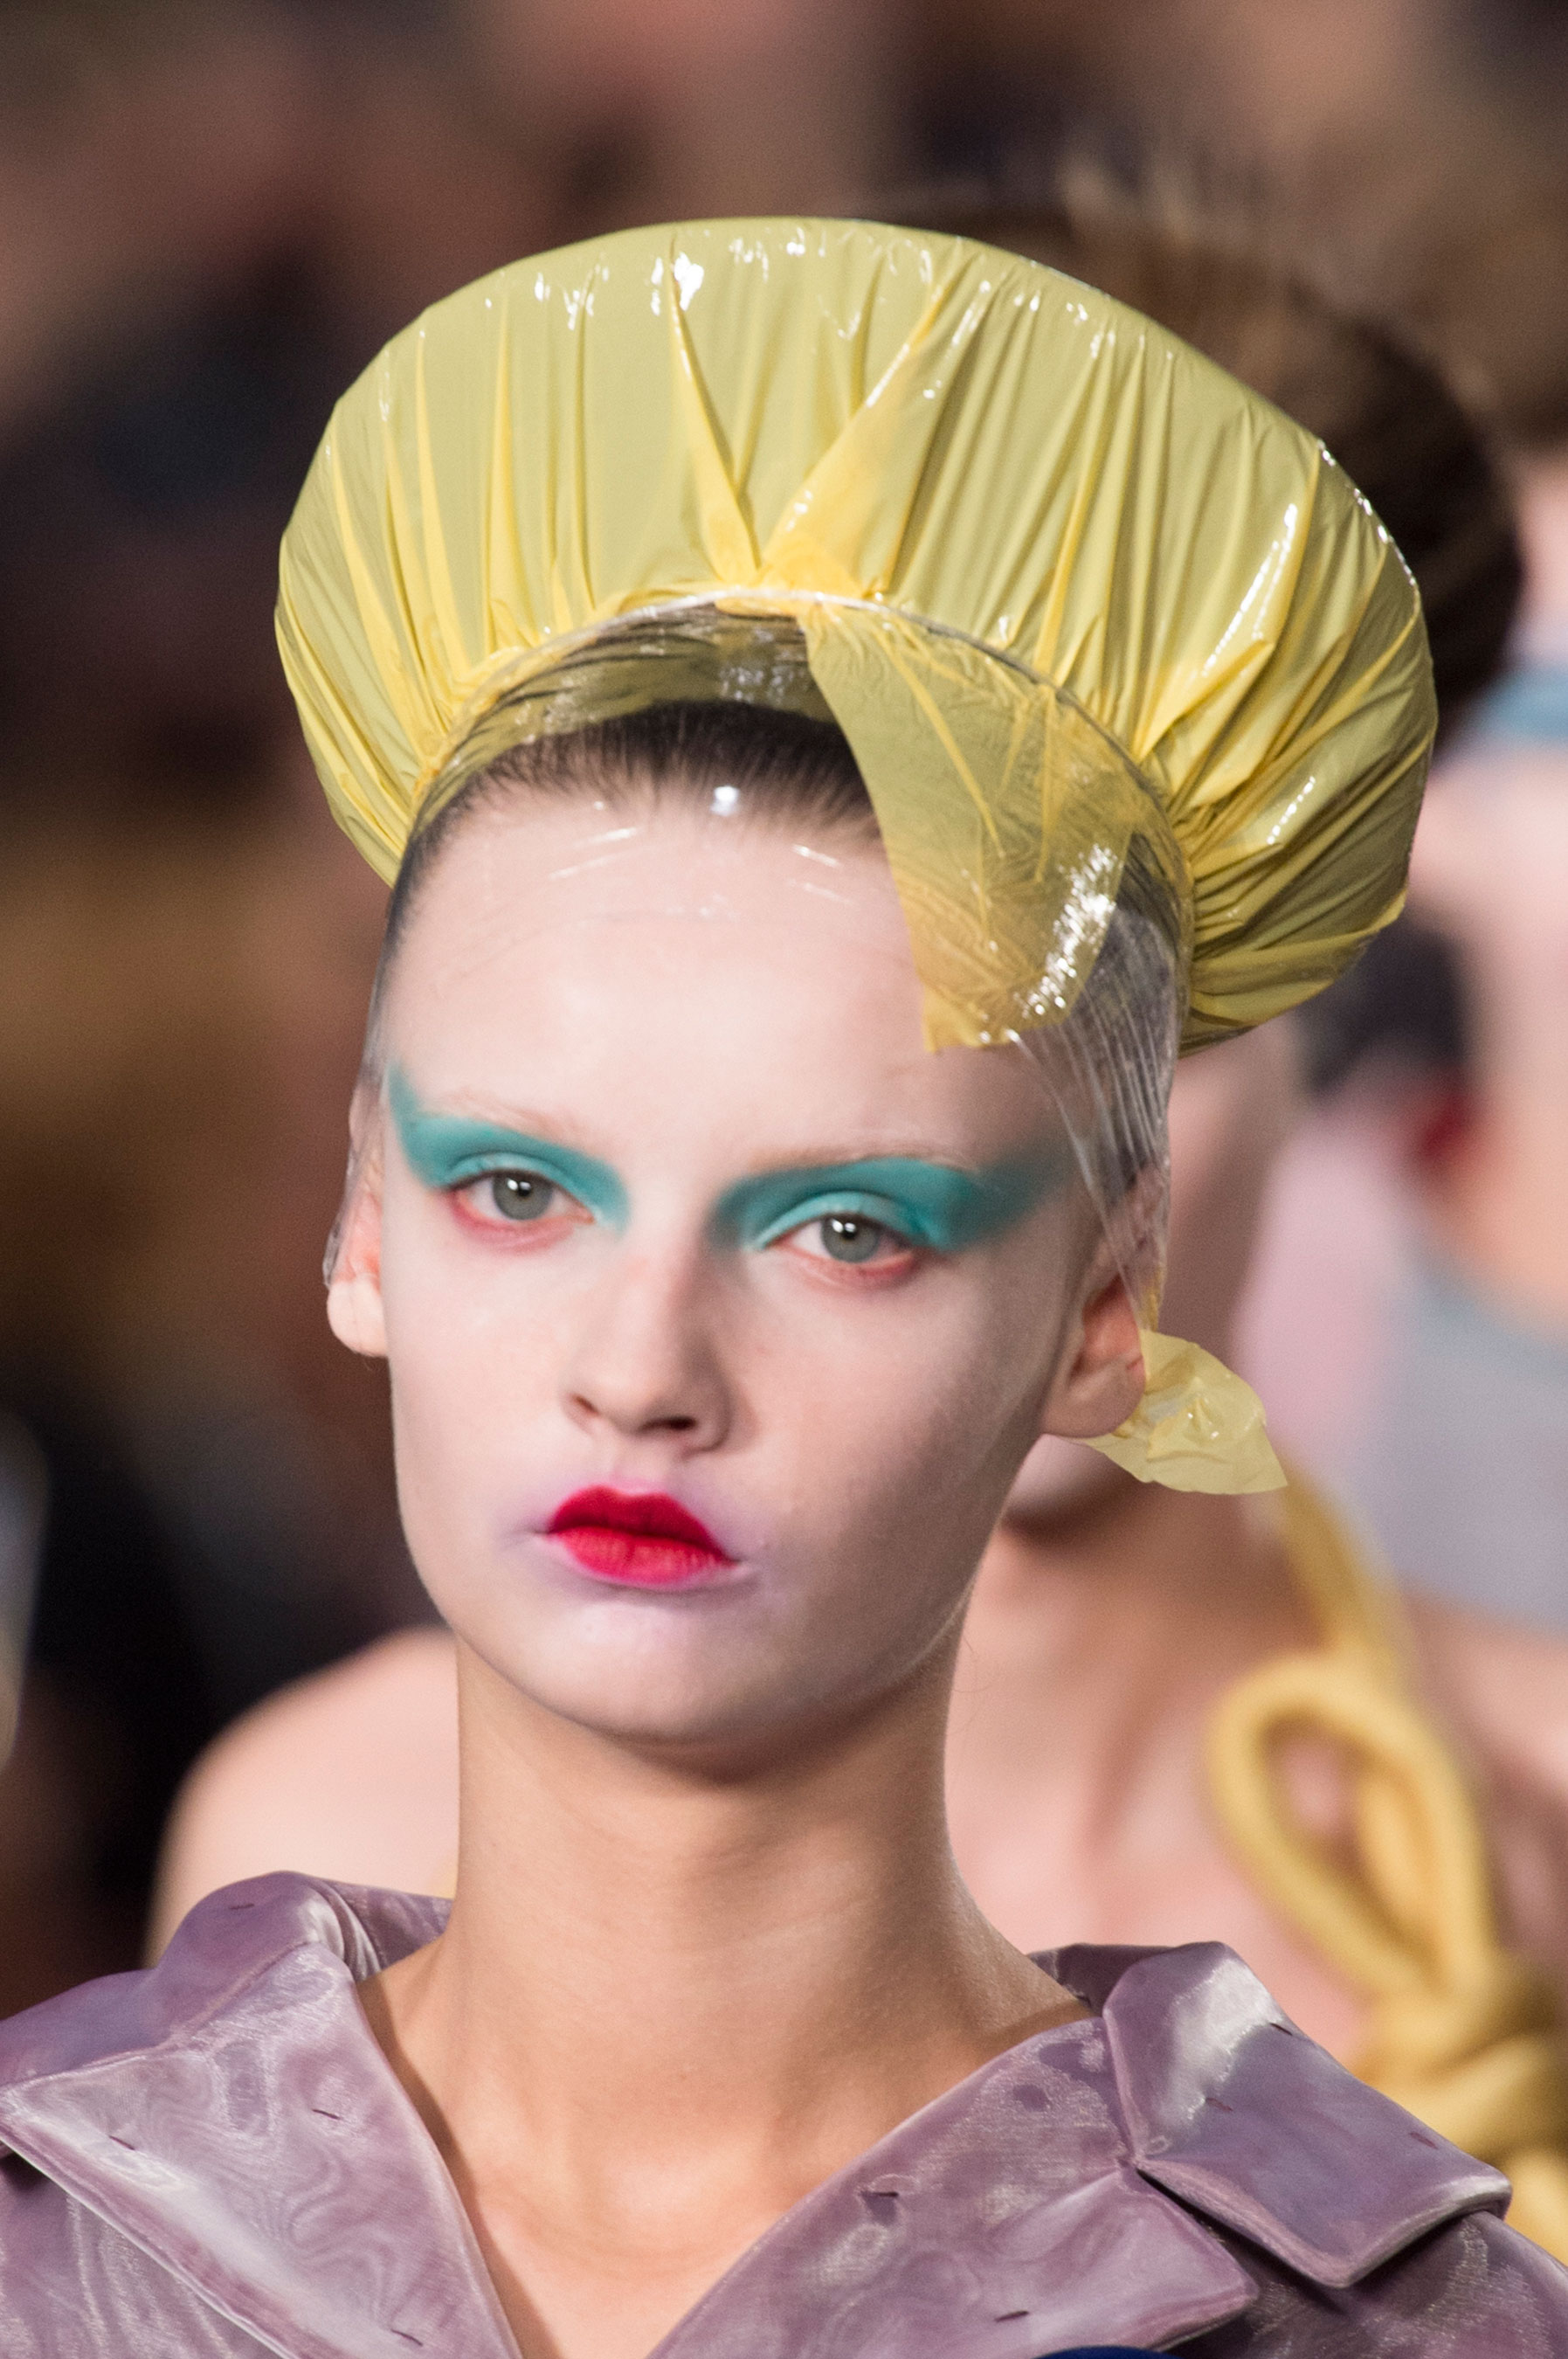 Maison-Margiela-spring-2016-runway-beauty-fashion-show-the-impression-085